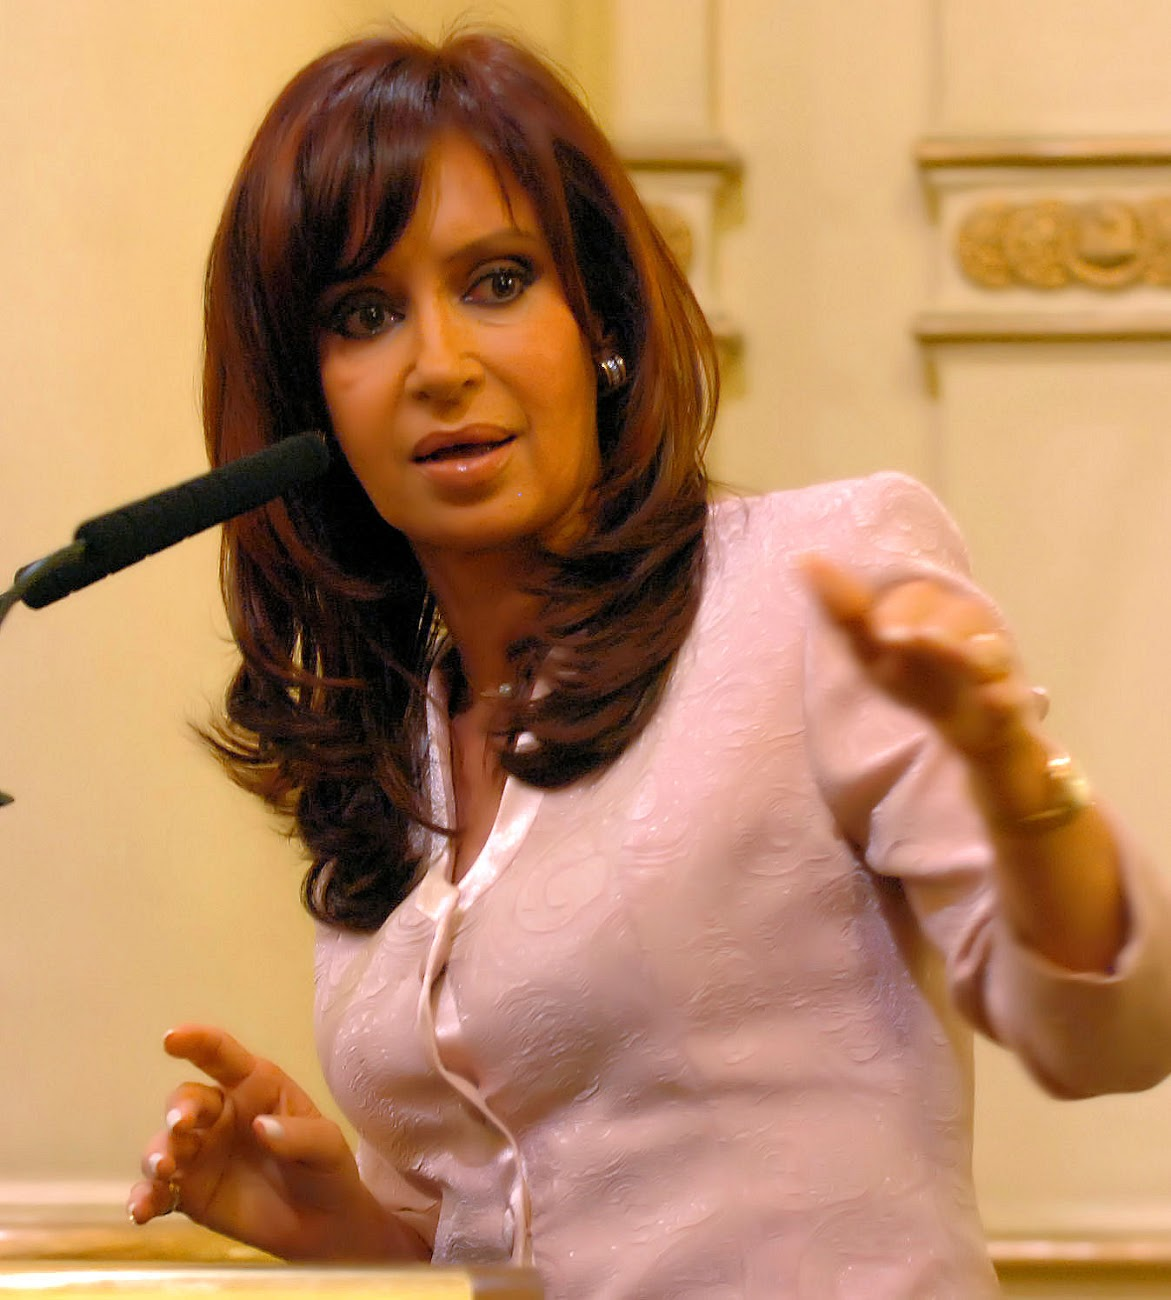 http://4.bp.blogspot.com/-6XF9Ecuk7r0/UOPUxDh03WI/AAAAAAAAAp4/fwCGSJrXMEo/s1300/Discurso_de_Cristina_Fern%C3%A1ndez_el_25_de_marzo_2008.jpg